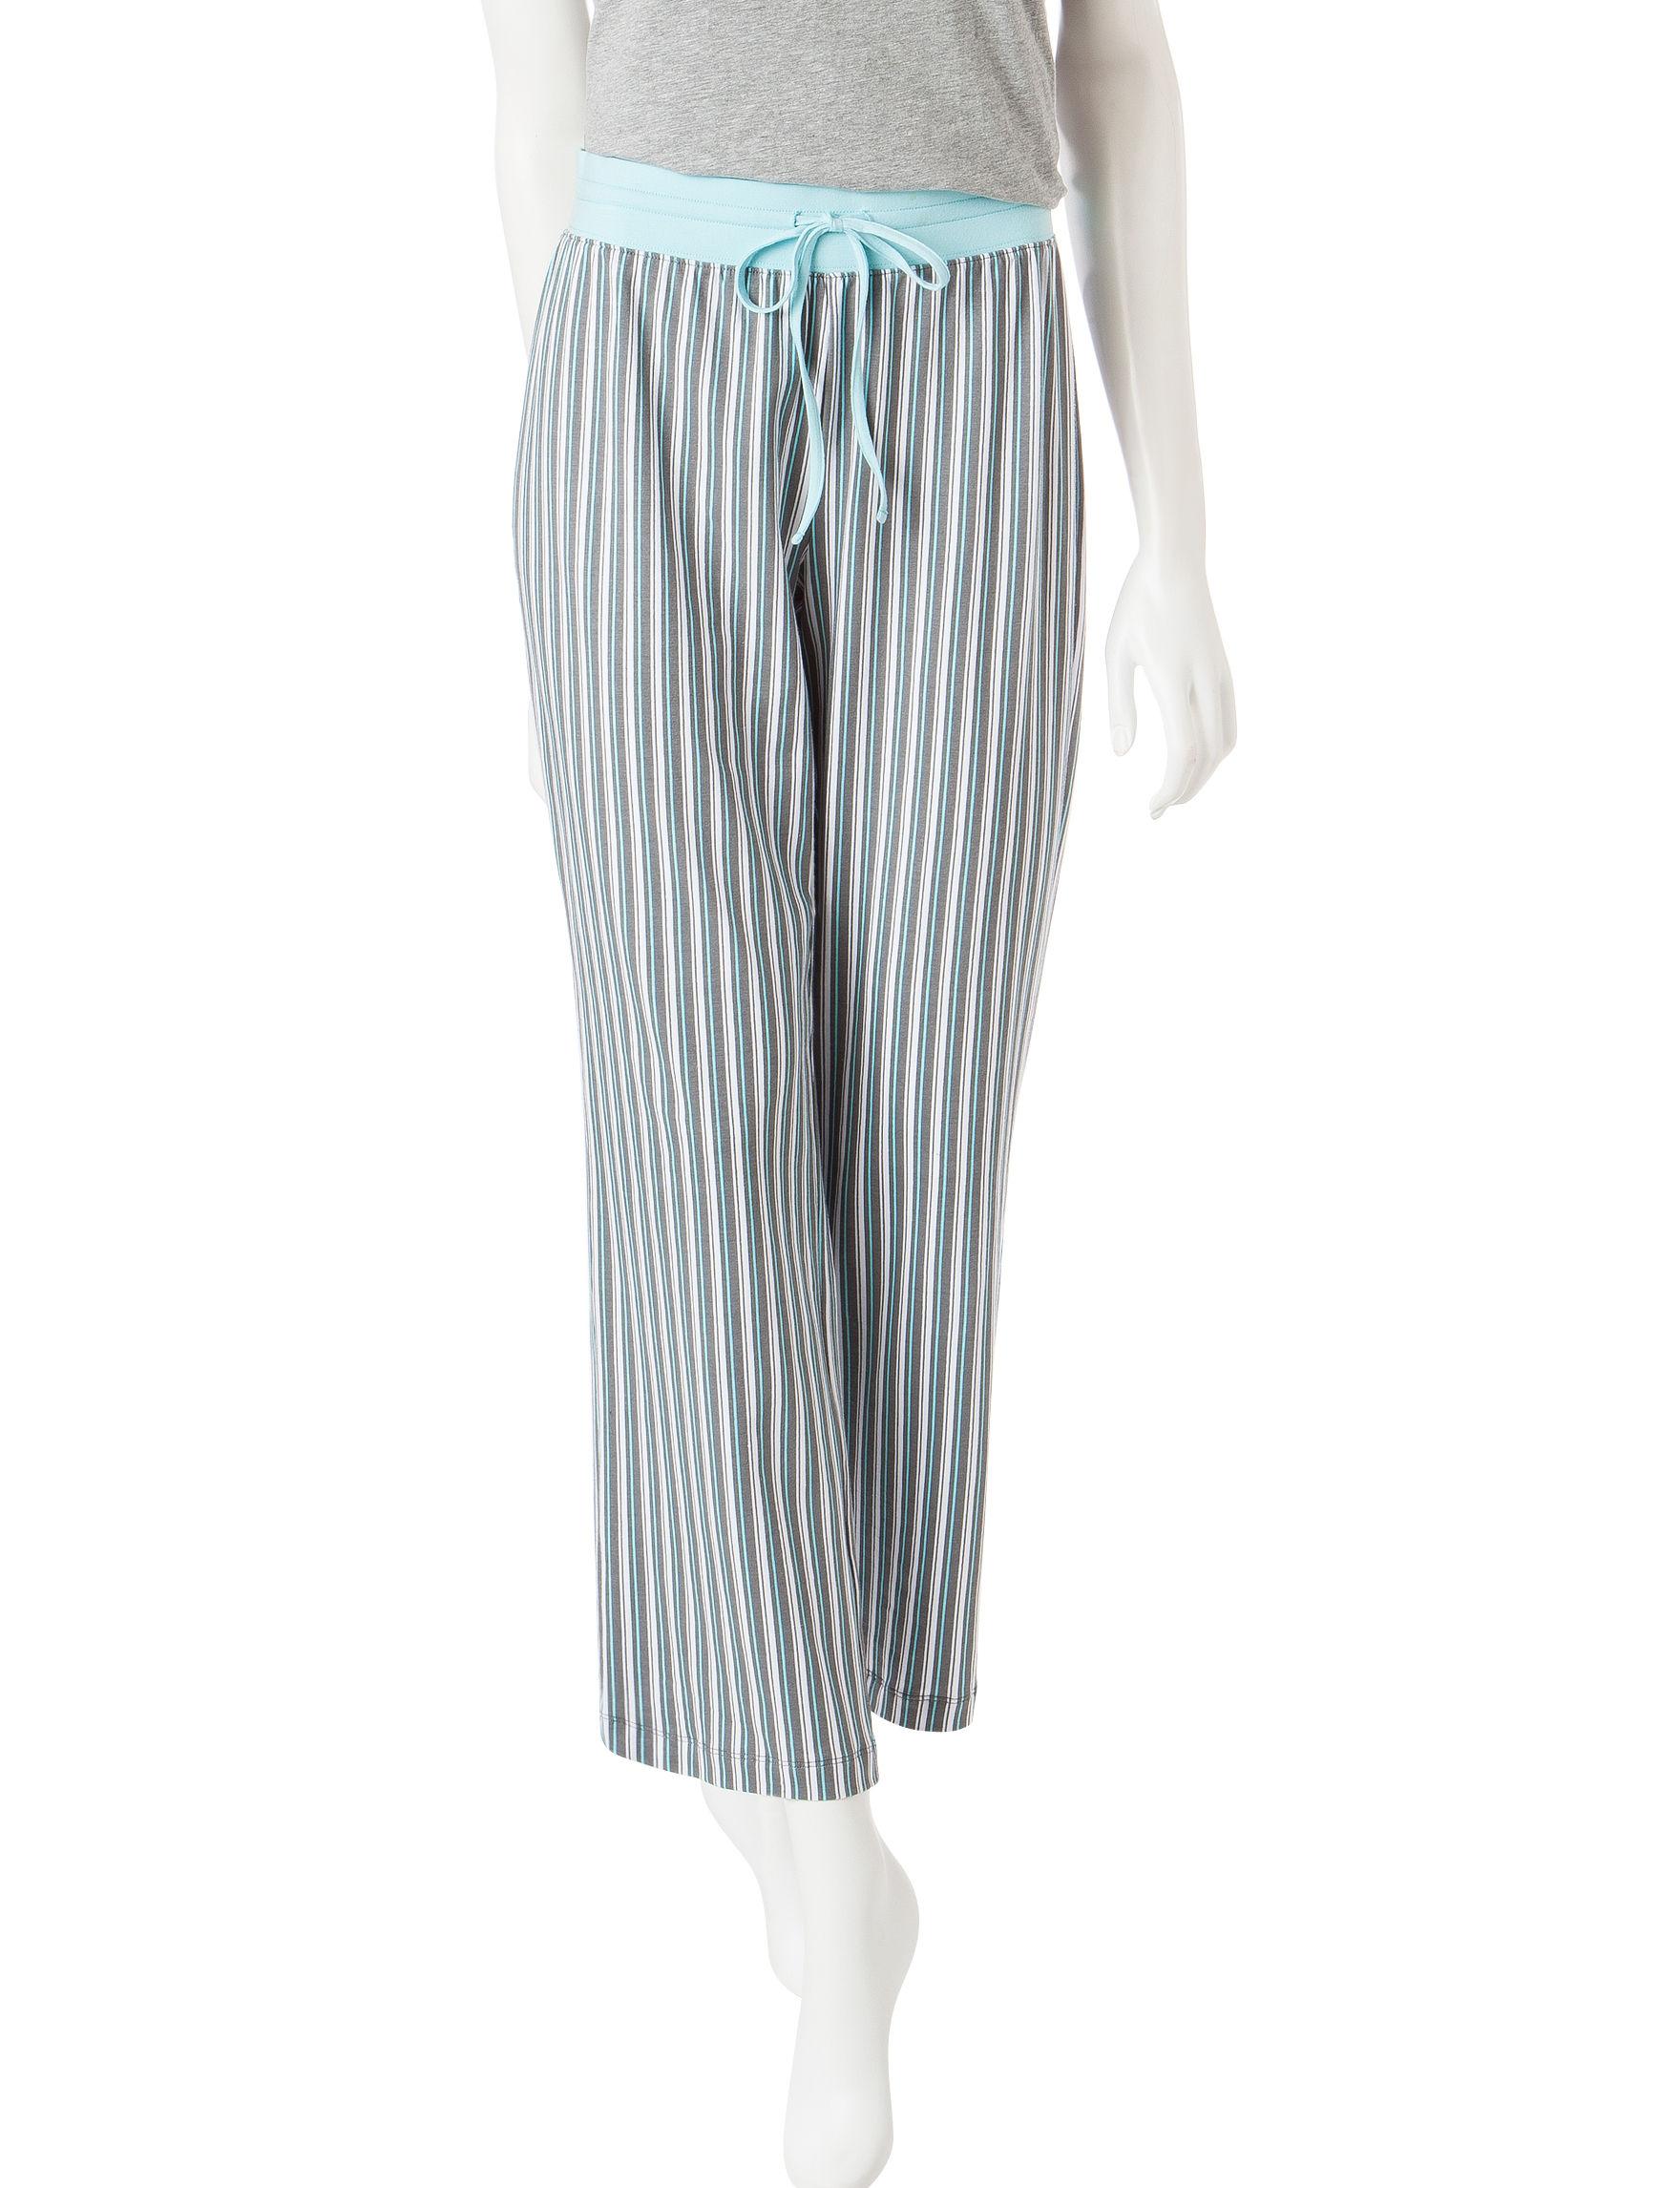 Rene Rofe Blue / Grey Pajama Bottoms